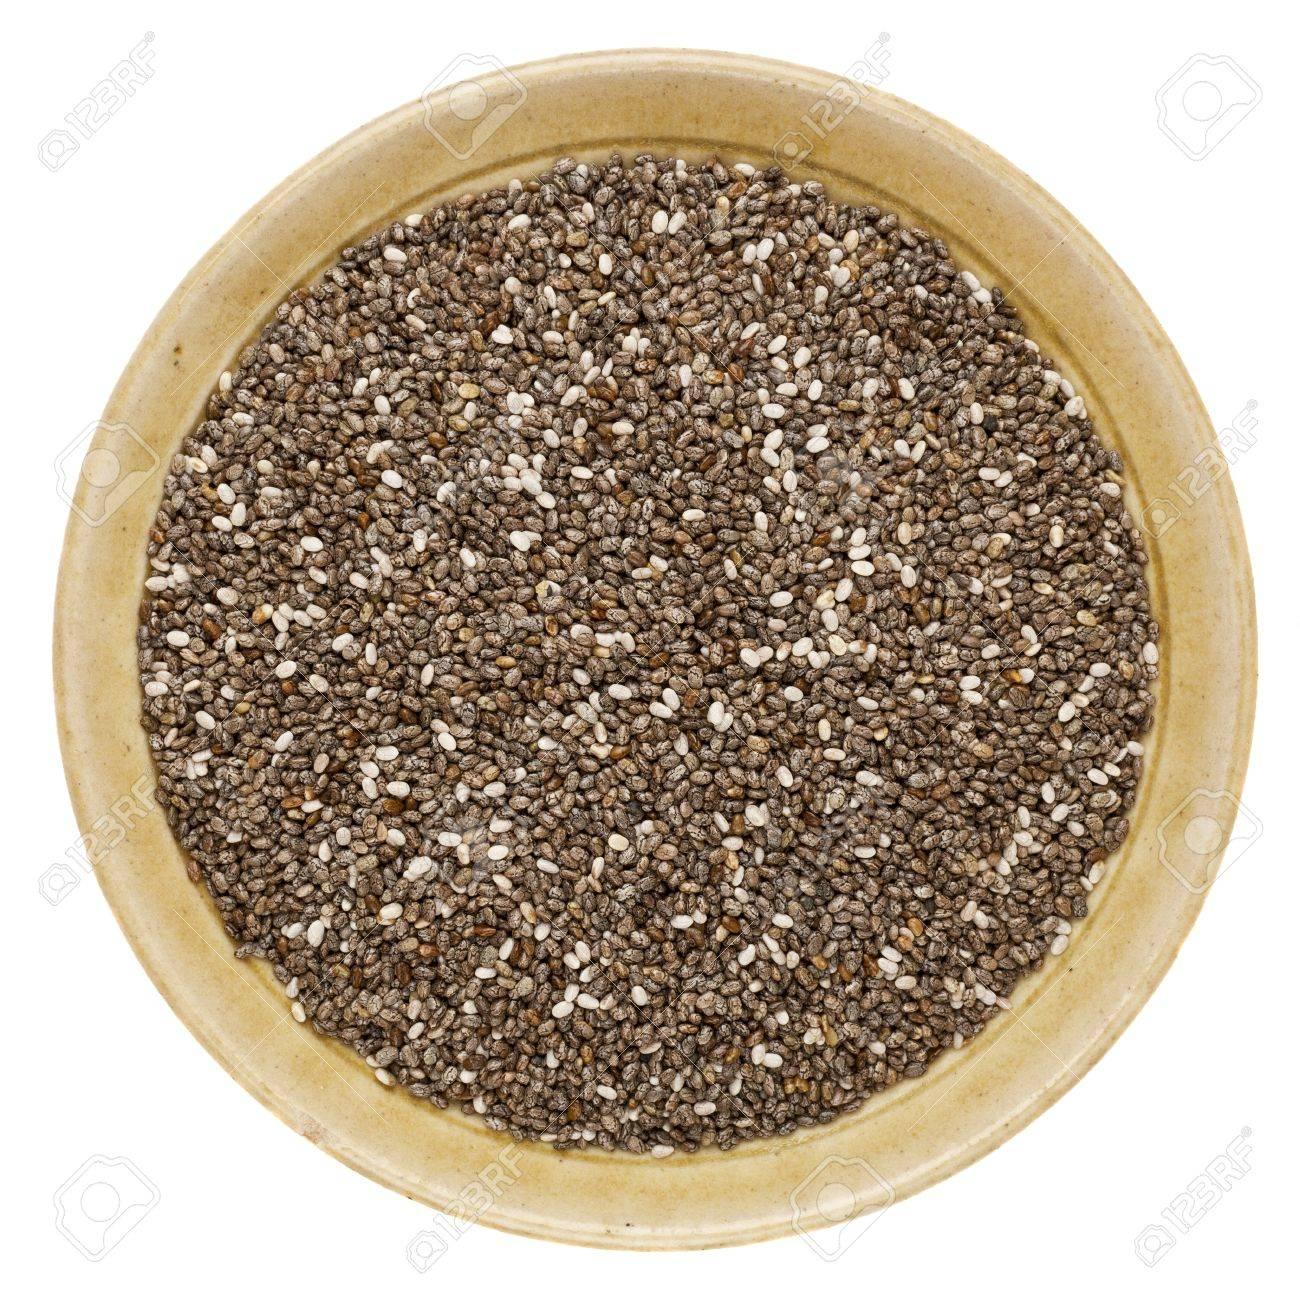 chia seeds (Salvia Hispanica) in a round ceramic bowl isolated on white Stock Photo - 15031367